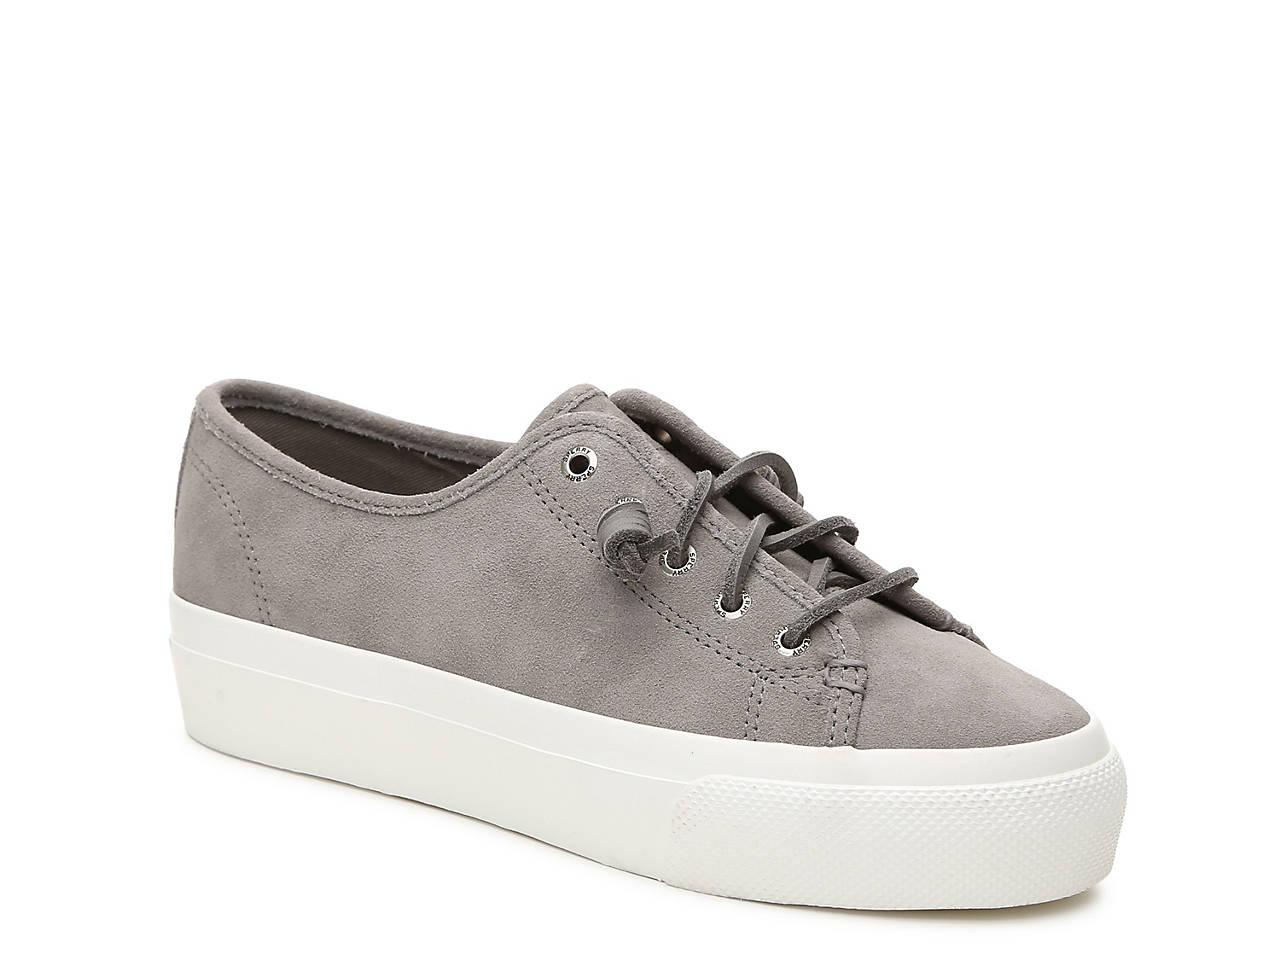 a7a414c47b3b Sperry Top-Sider Sky Sail Platform Slip-On Sneaker Men s Shoes